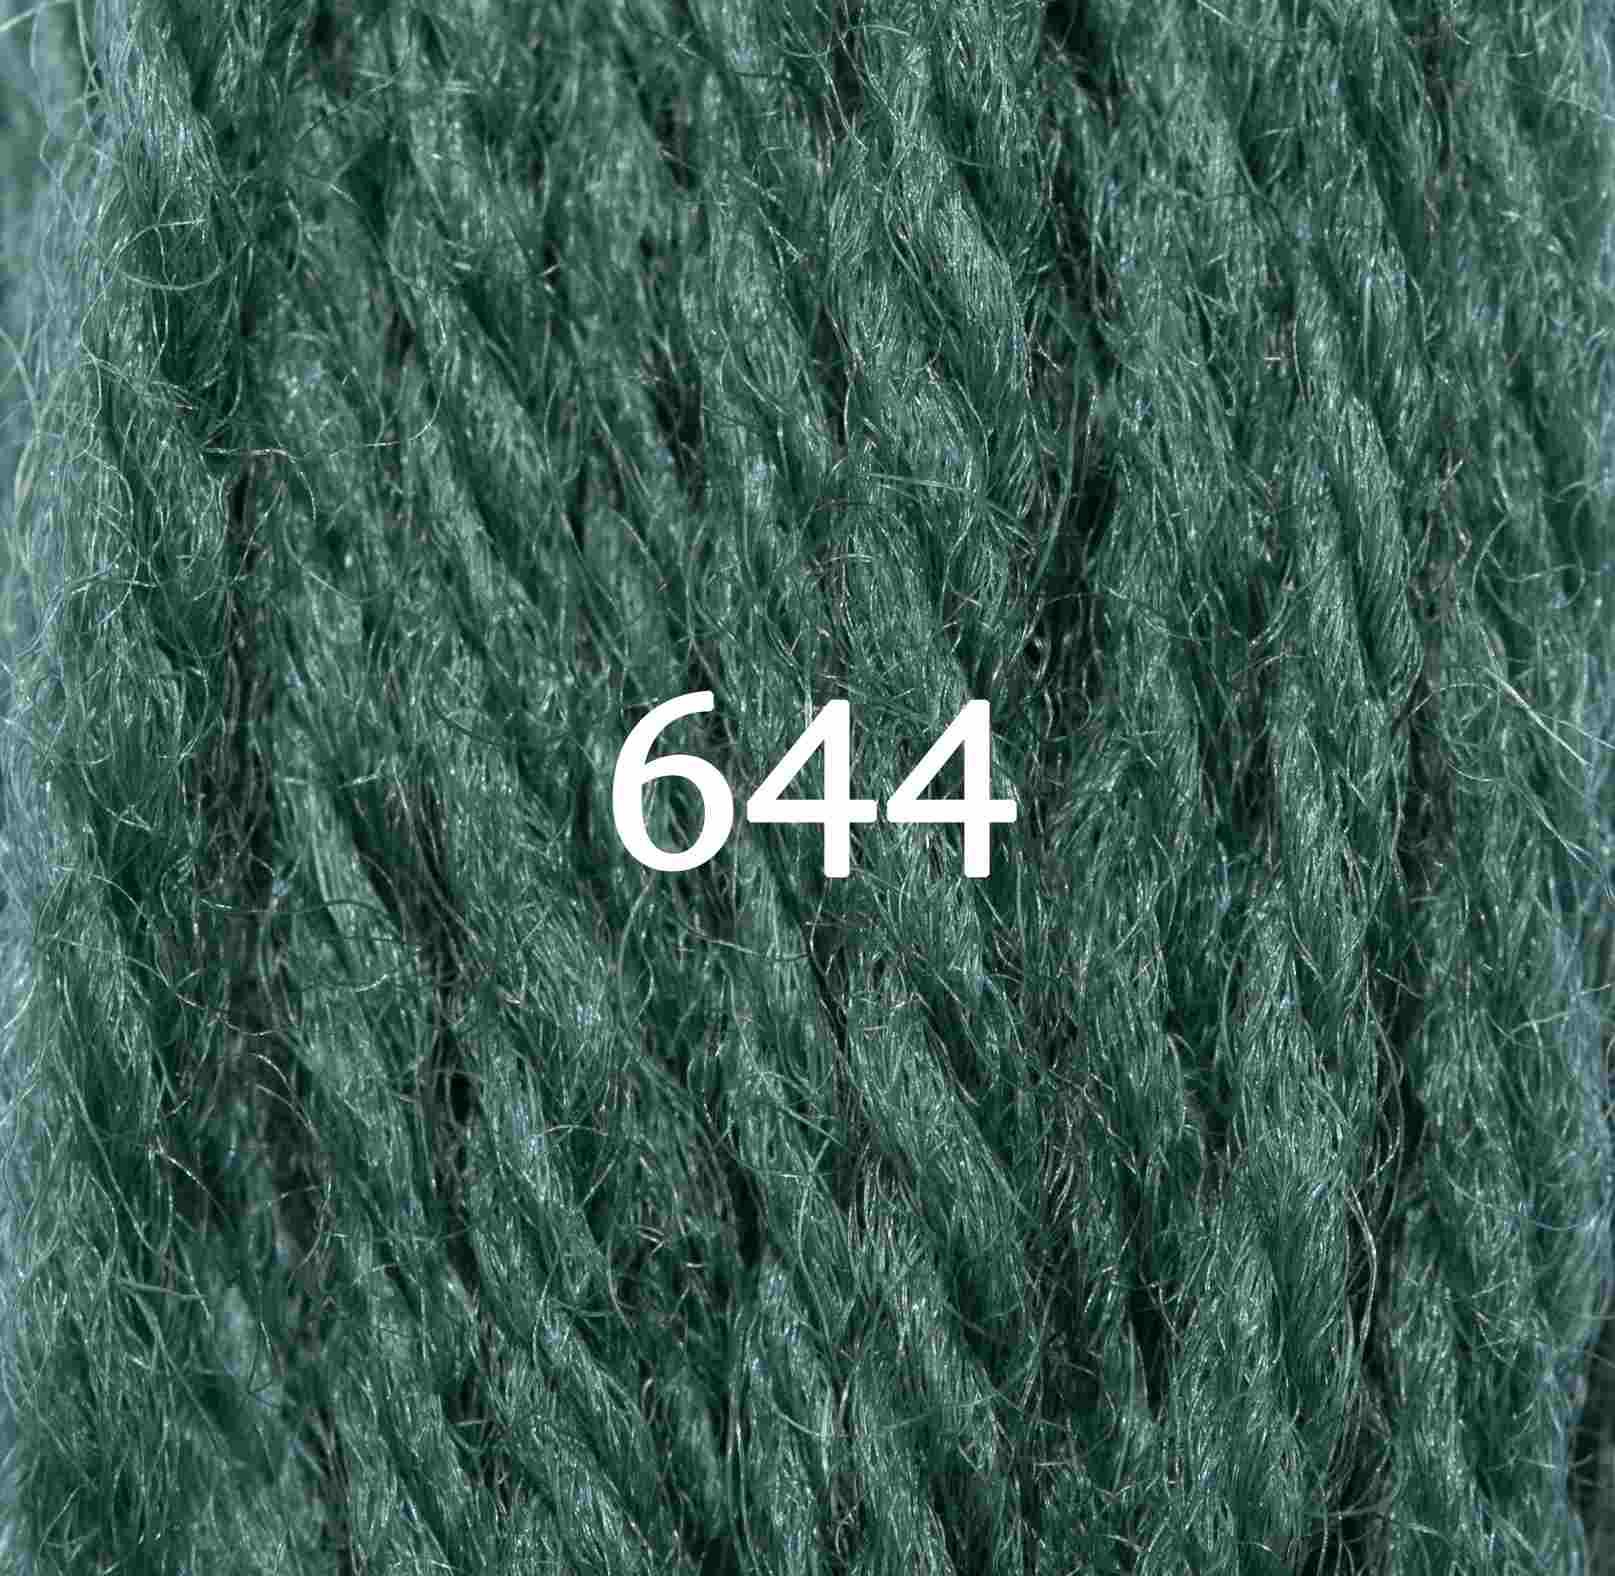 Peacock-Blue-644